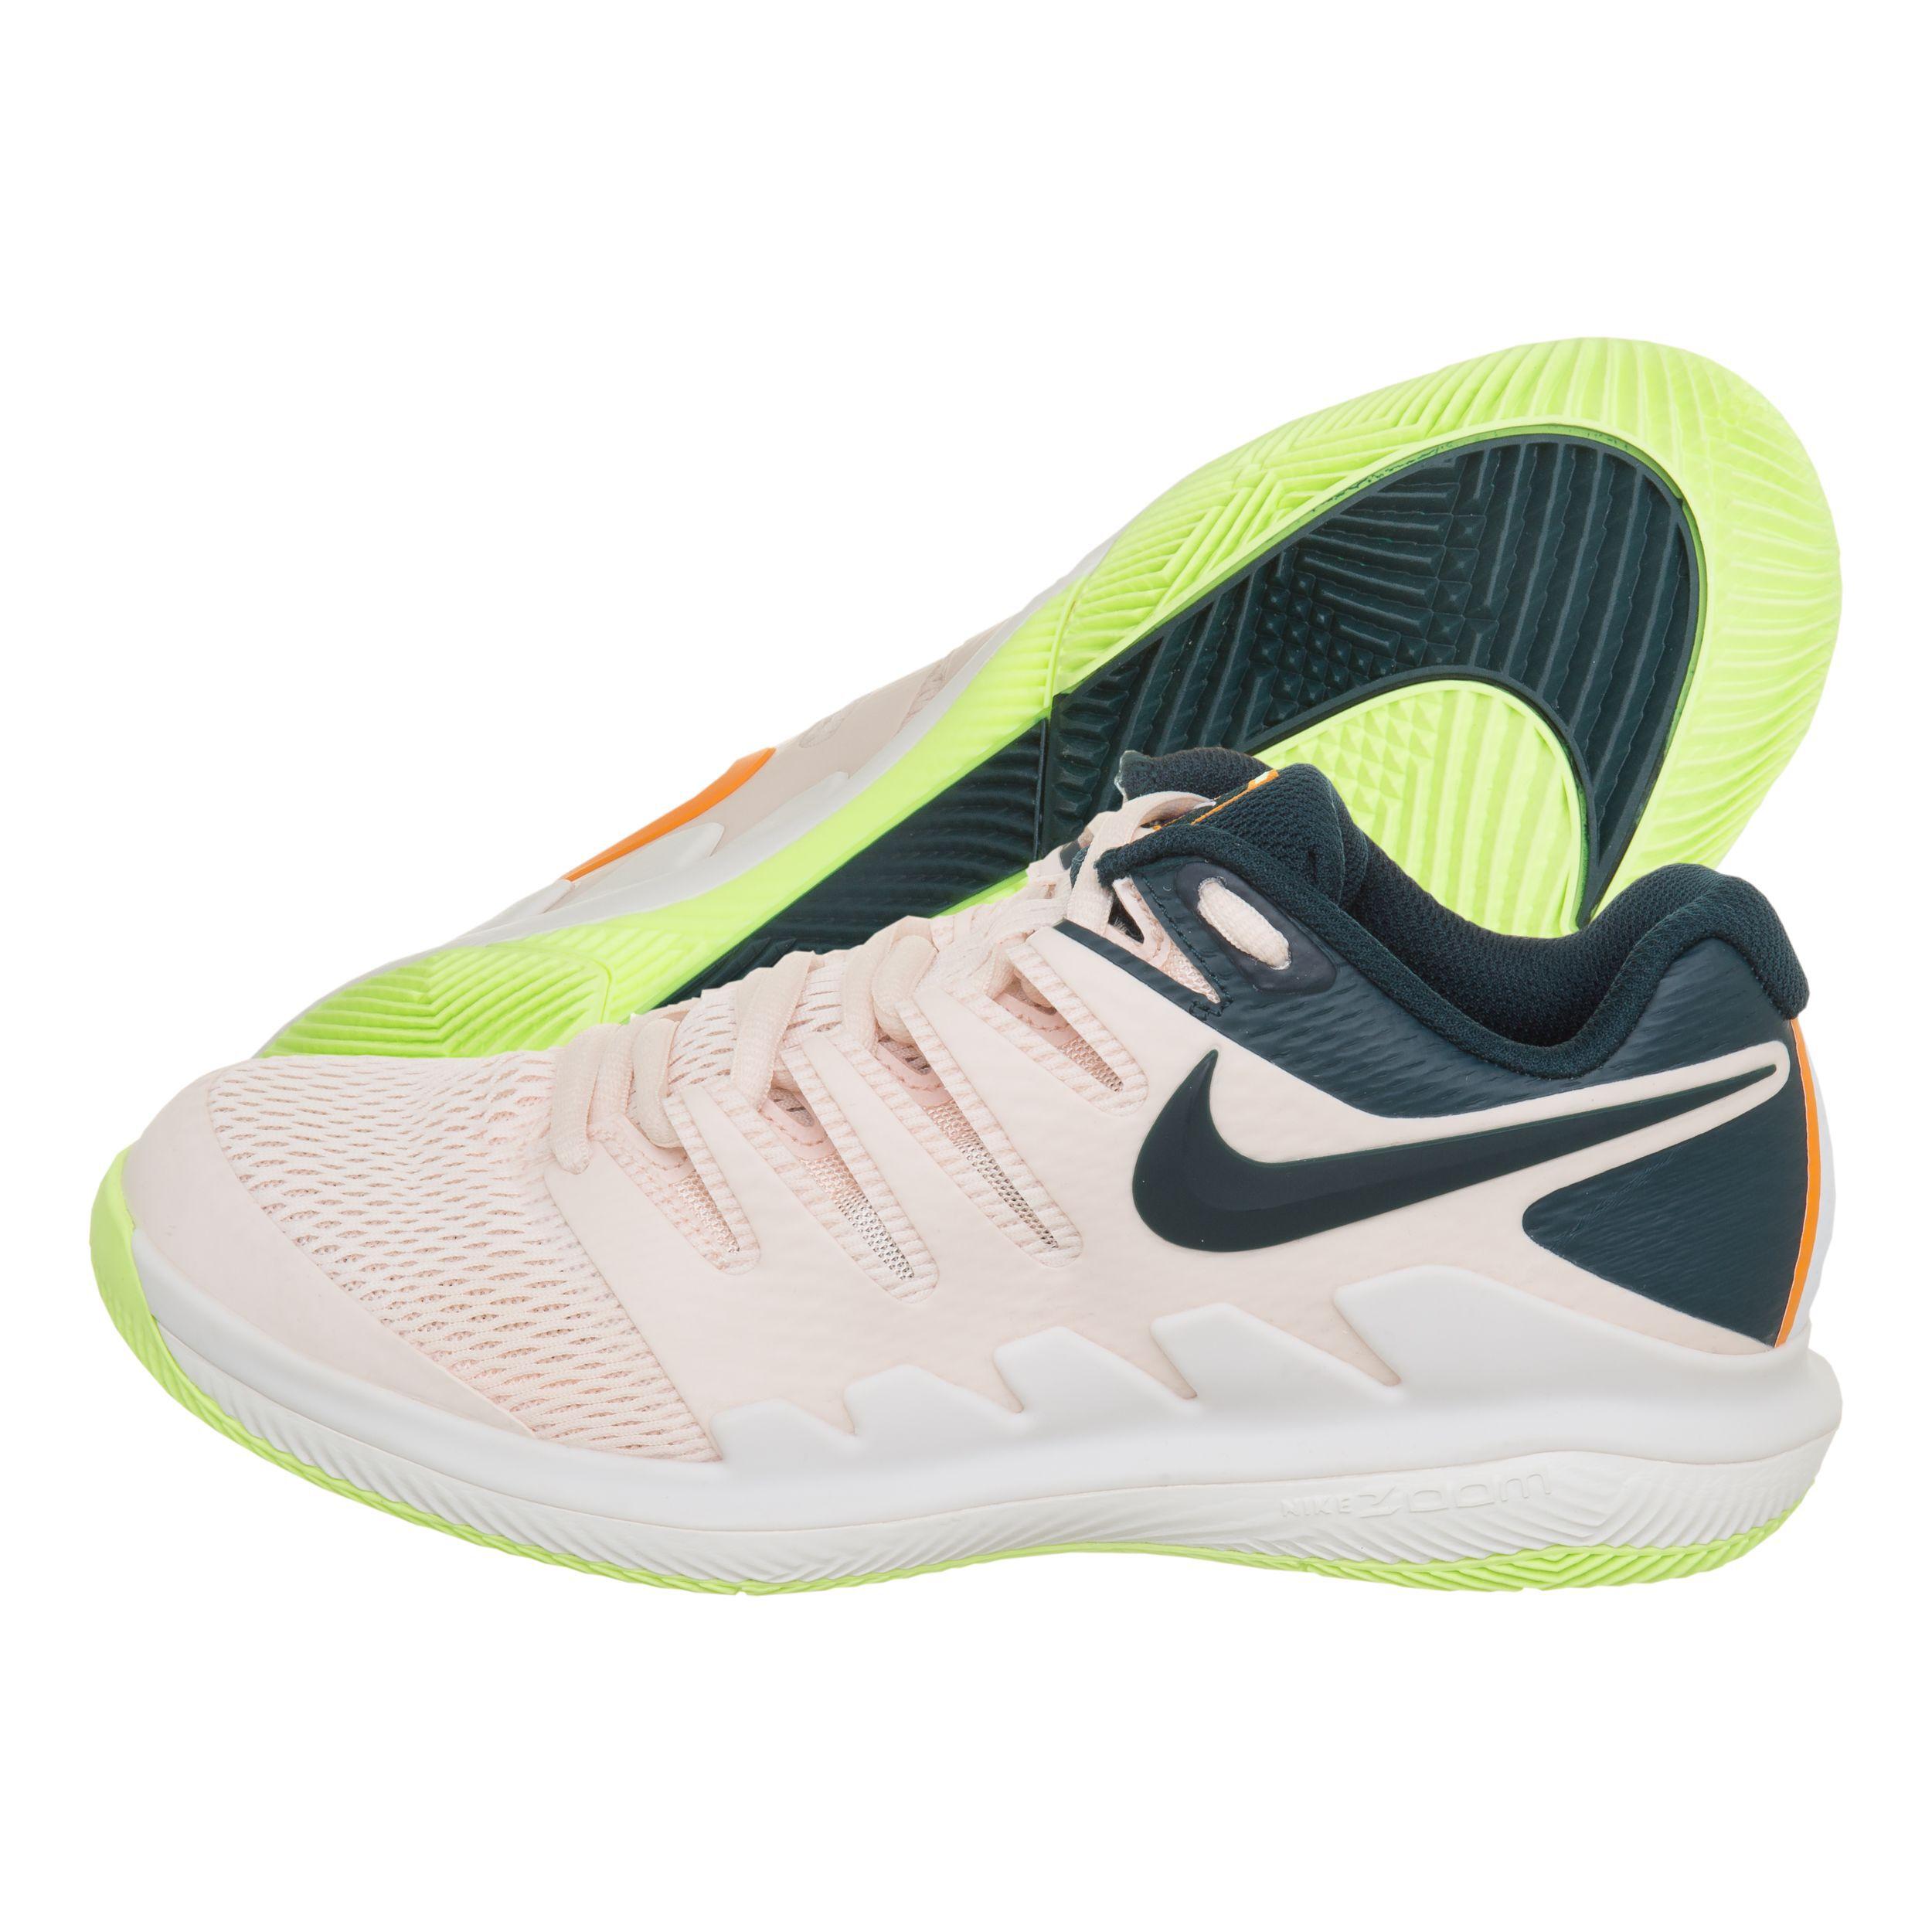 Nike Air Zoom Vapor X Allcourtschuh Damen Apricot, Dunkelblau